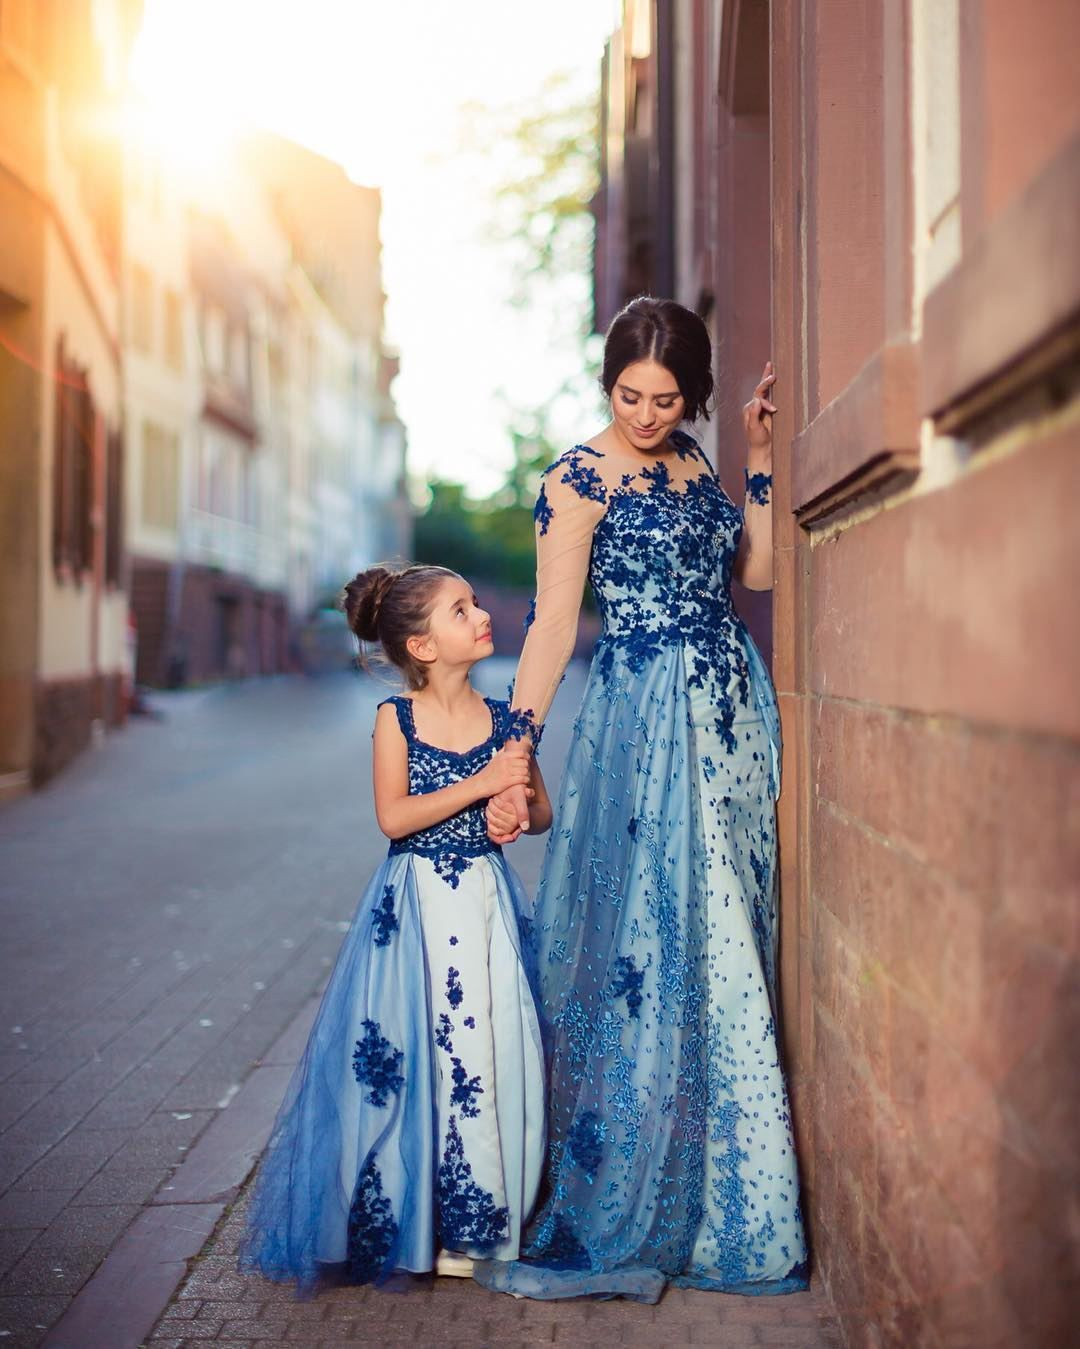 efbdd1b432332 Royal Blue Lace Flower Girl Dress Kids Pageant Party Wedding ...